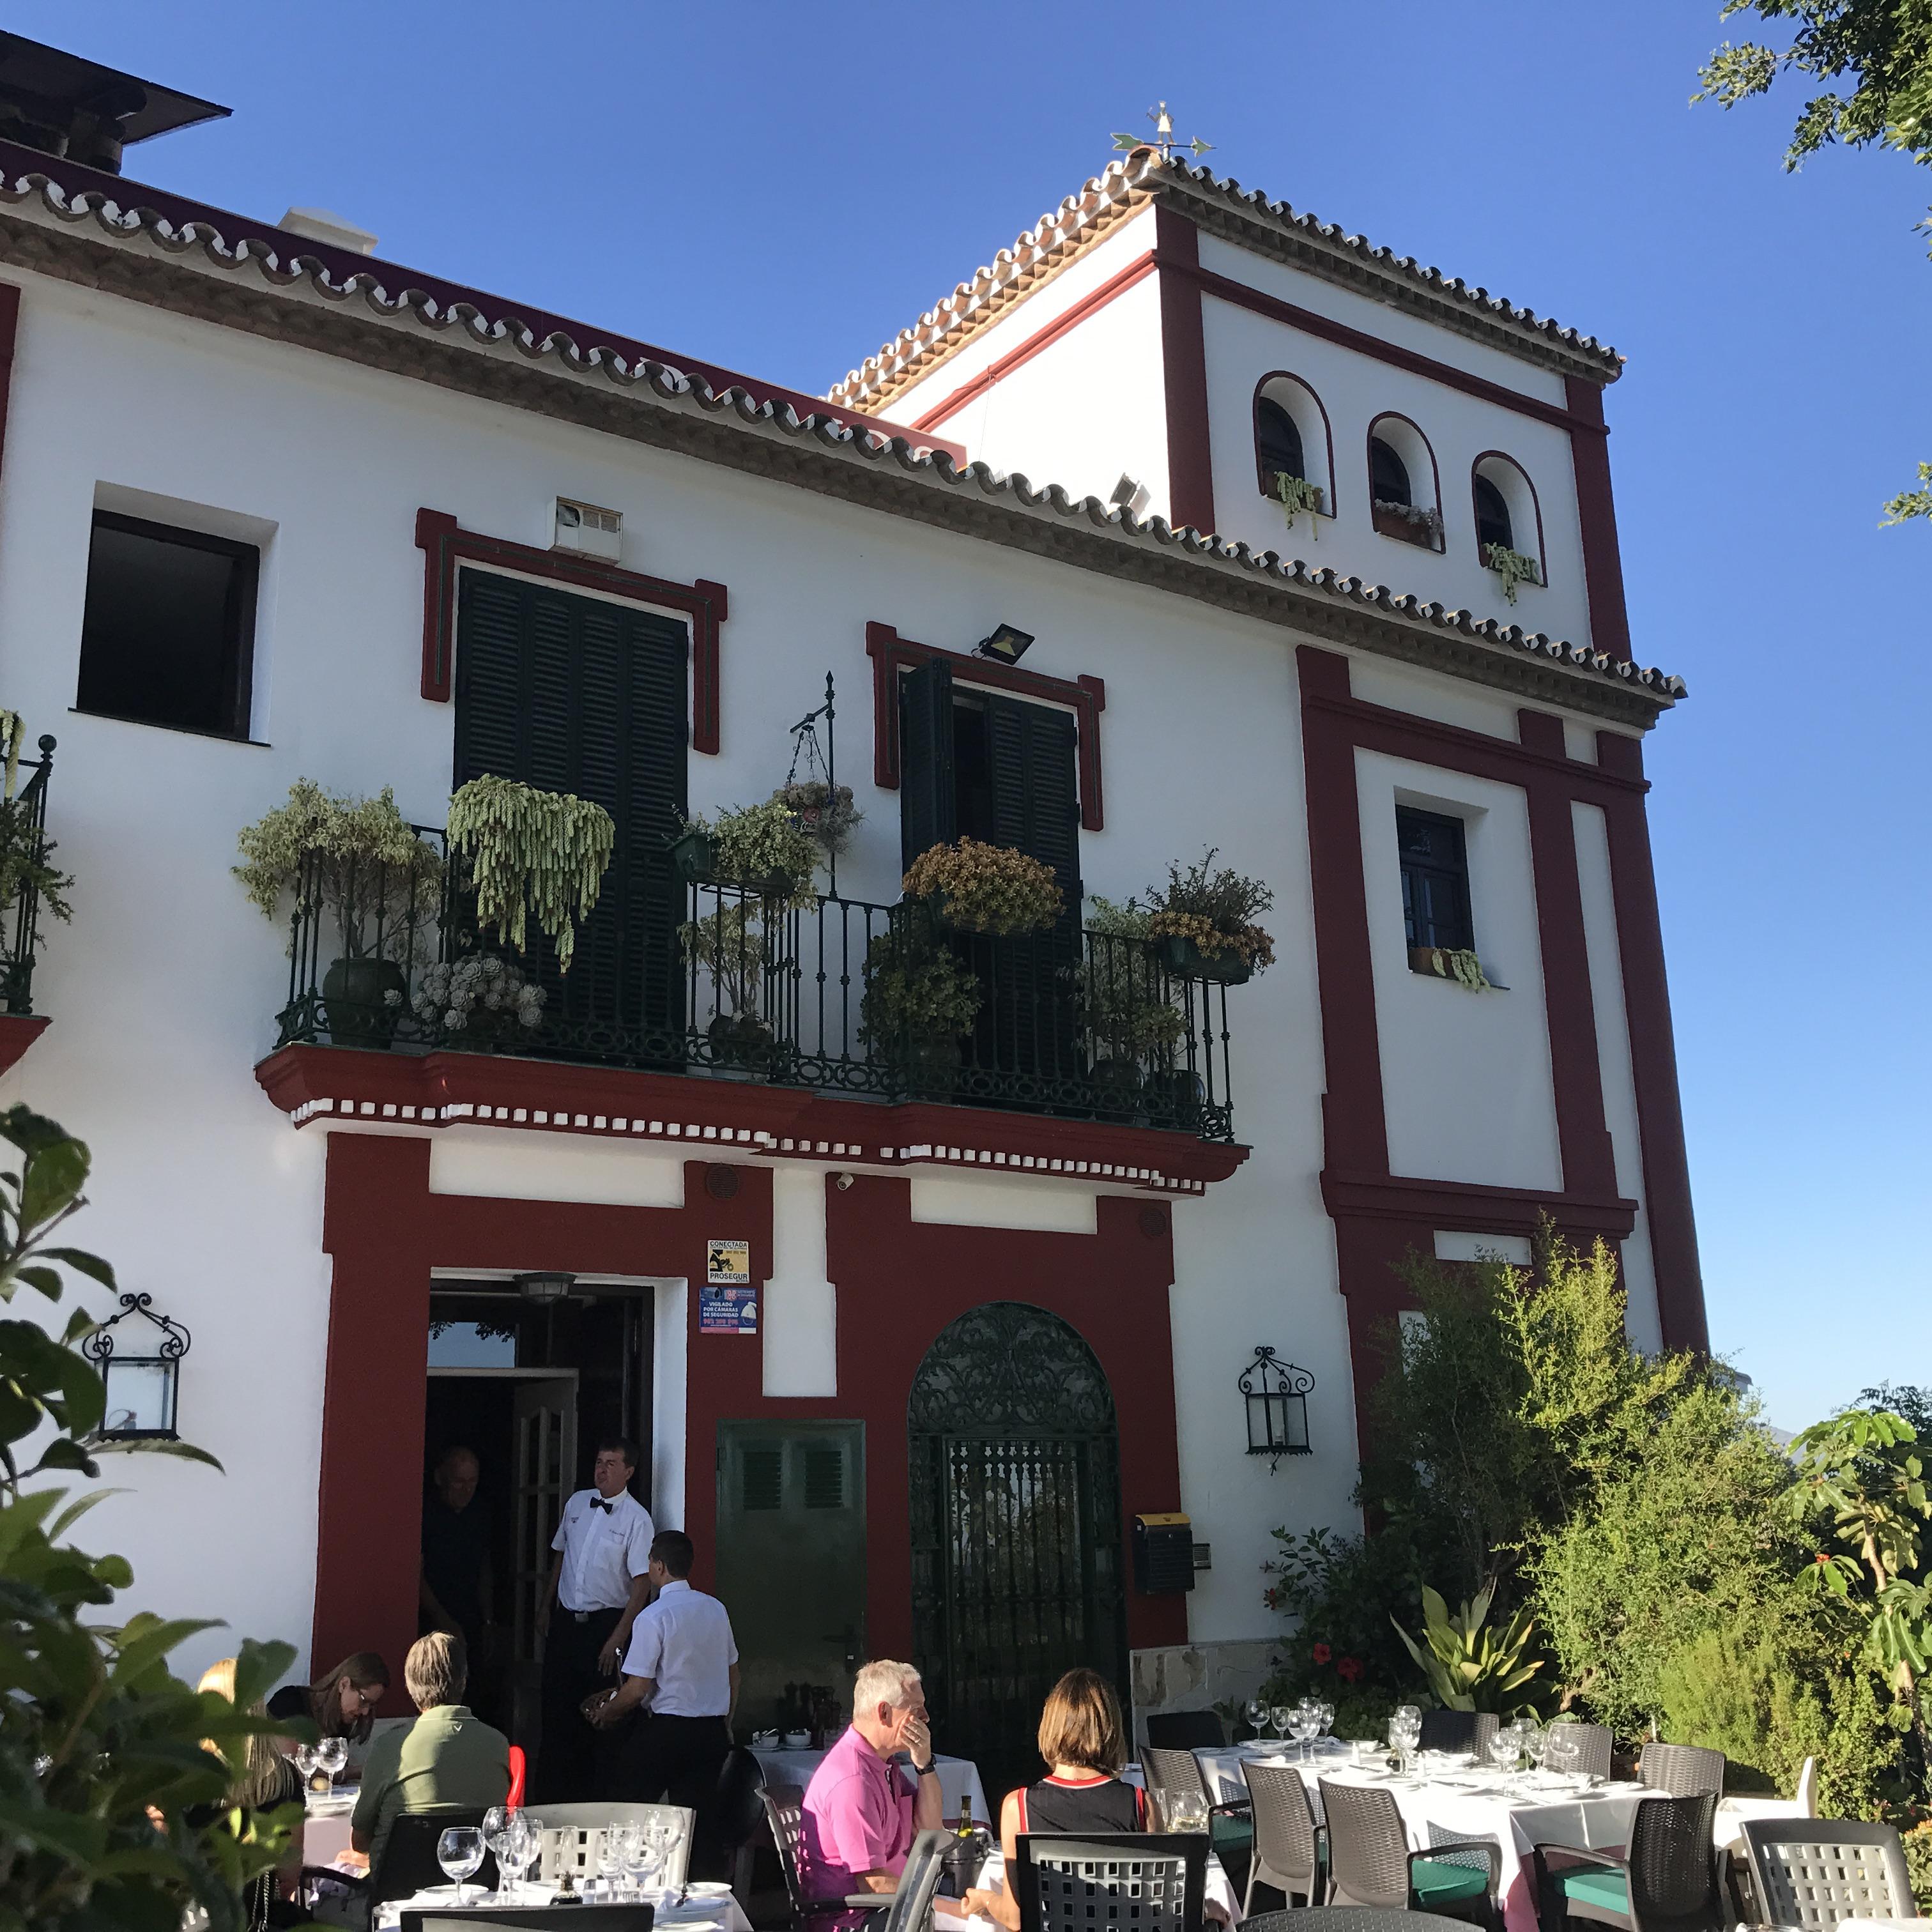 5 reasons to visit Benahavis, Spain